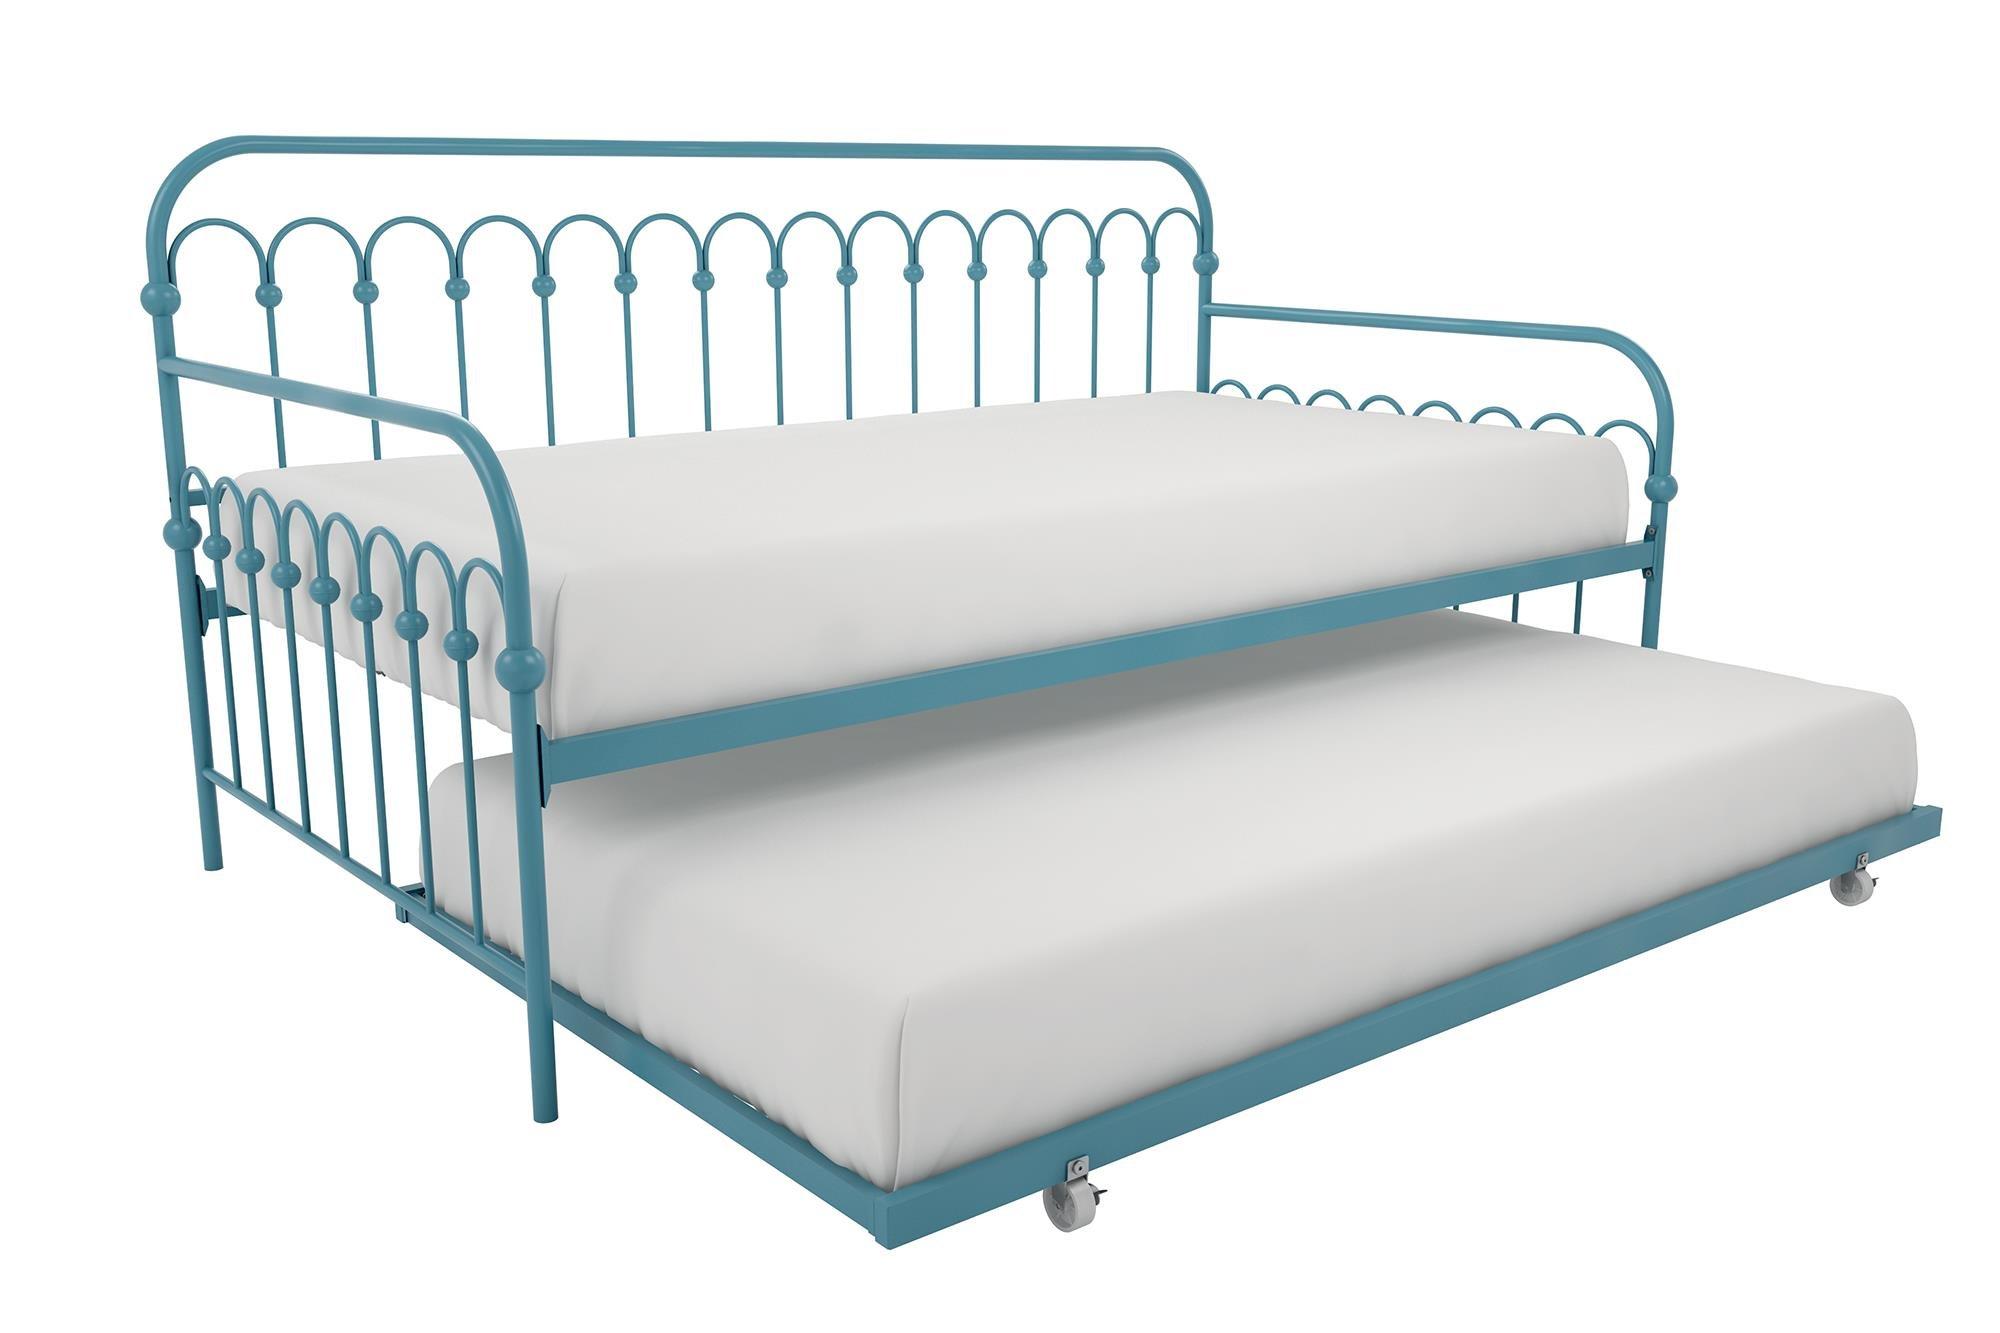 Novogratz Bright Pop Metal Bed, Adjustable Height for Under Bed Storage, Slats Included, Twin Size Frame, Blue Turquoise